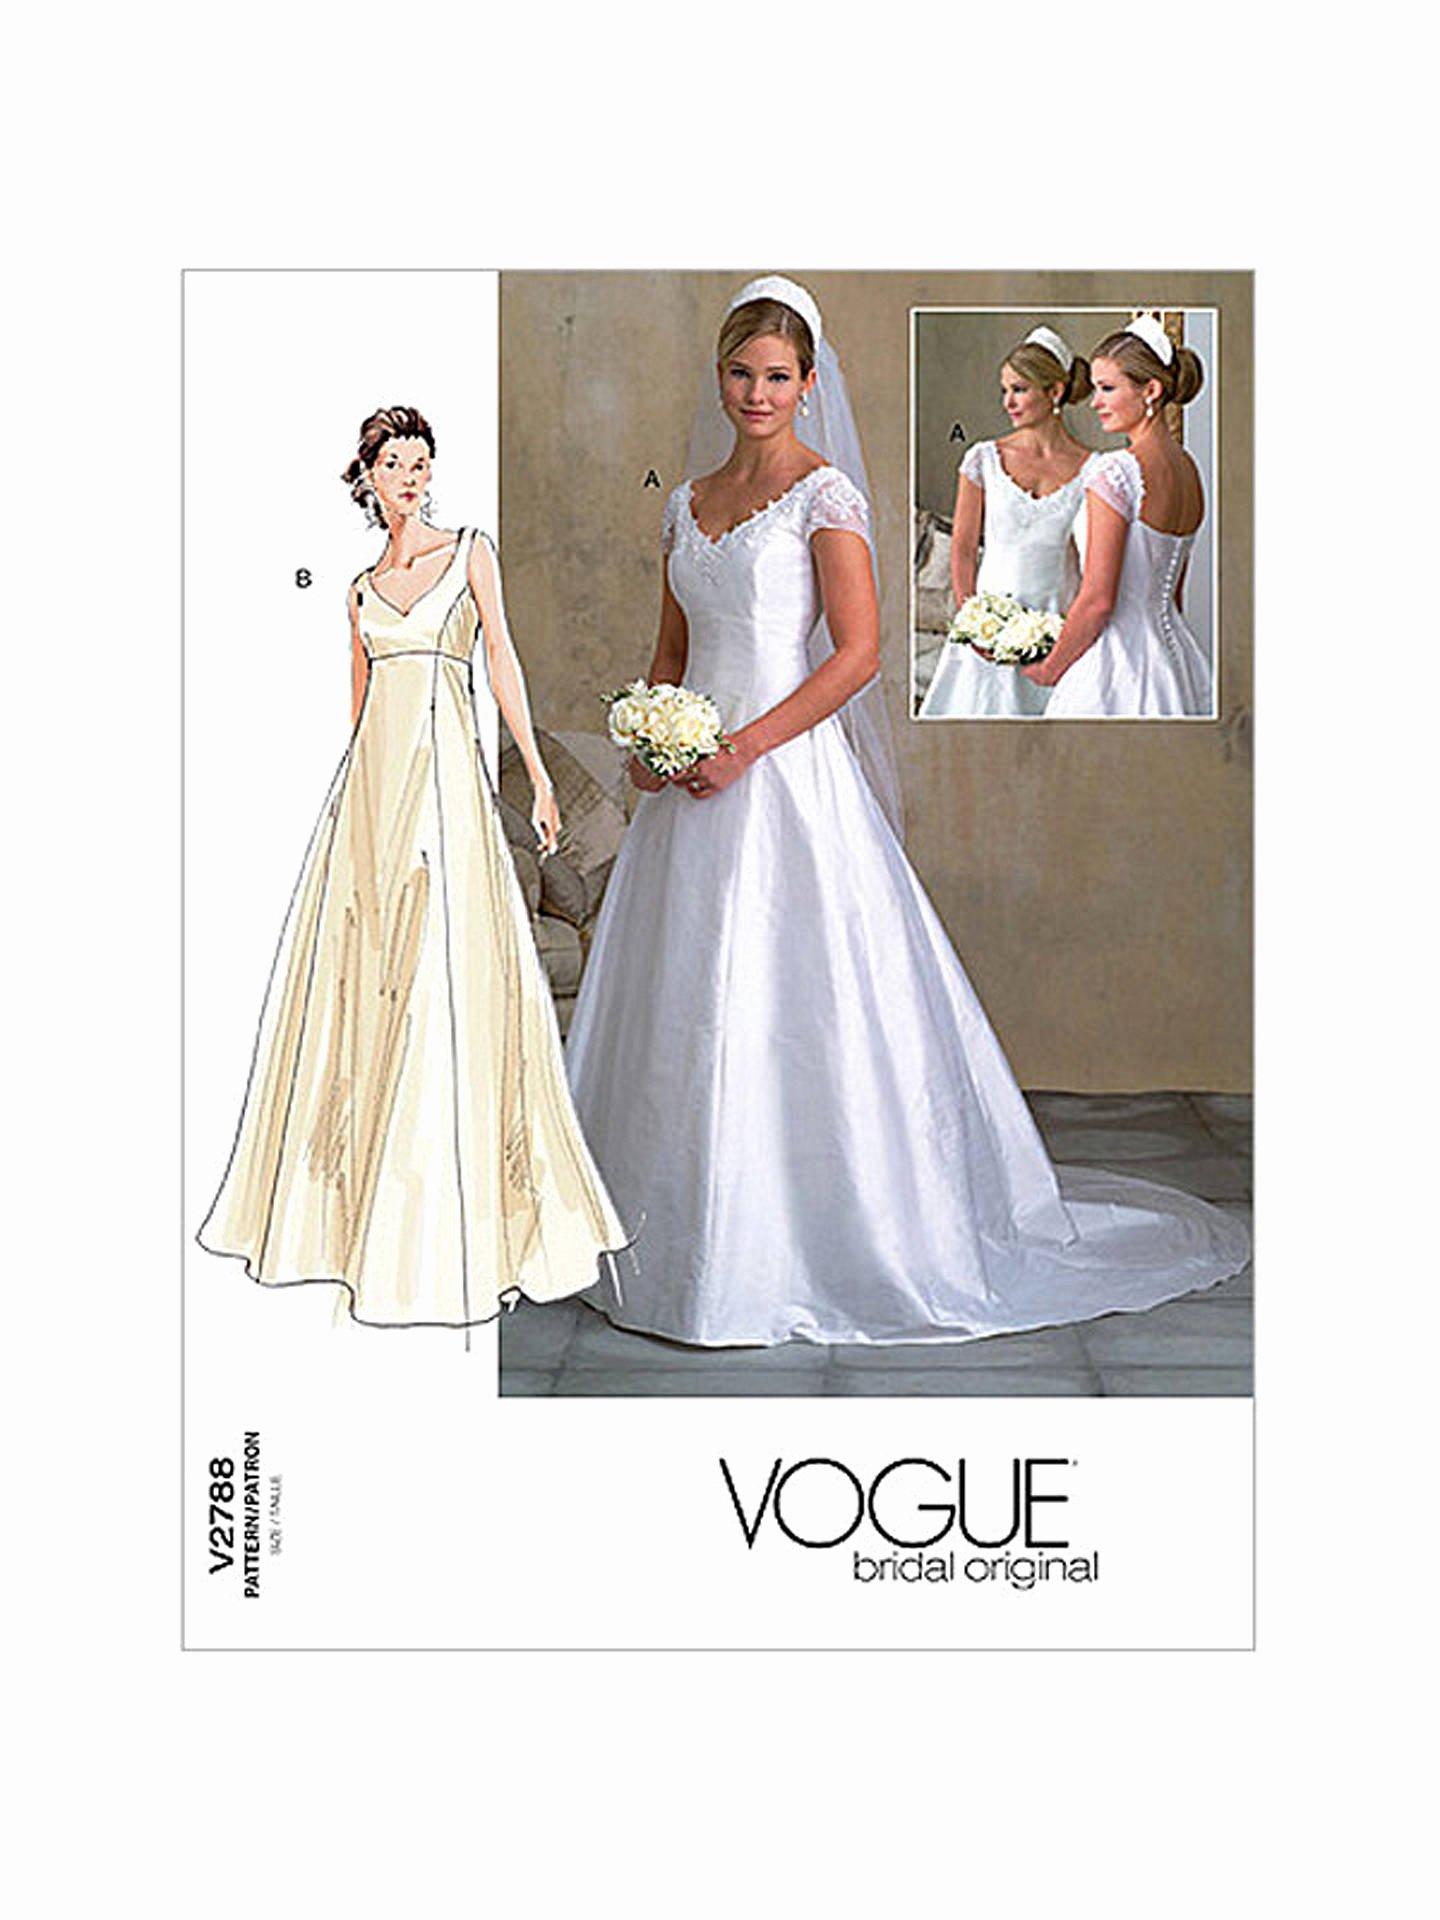 Simple Wedding Dress Patterns Beautiful Vogue Women S Bridal Gown Sewing Pattern 2788 at John